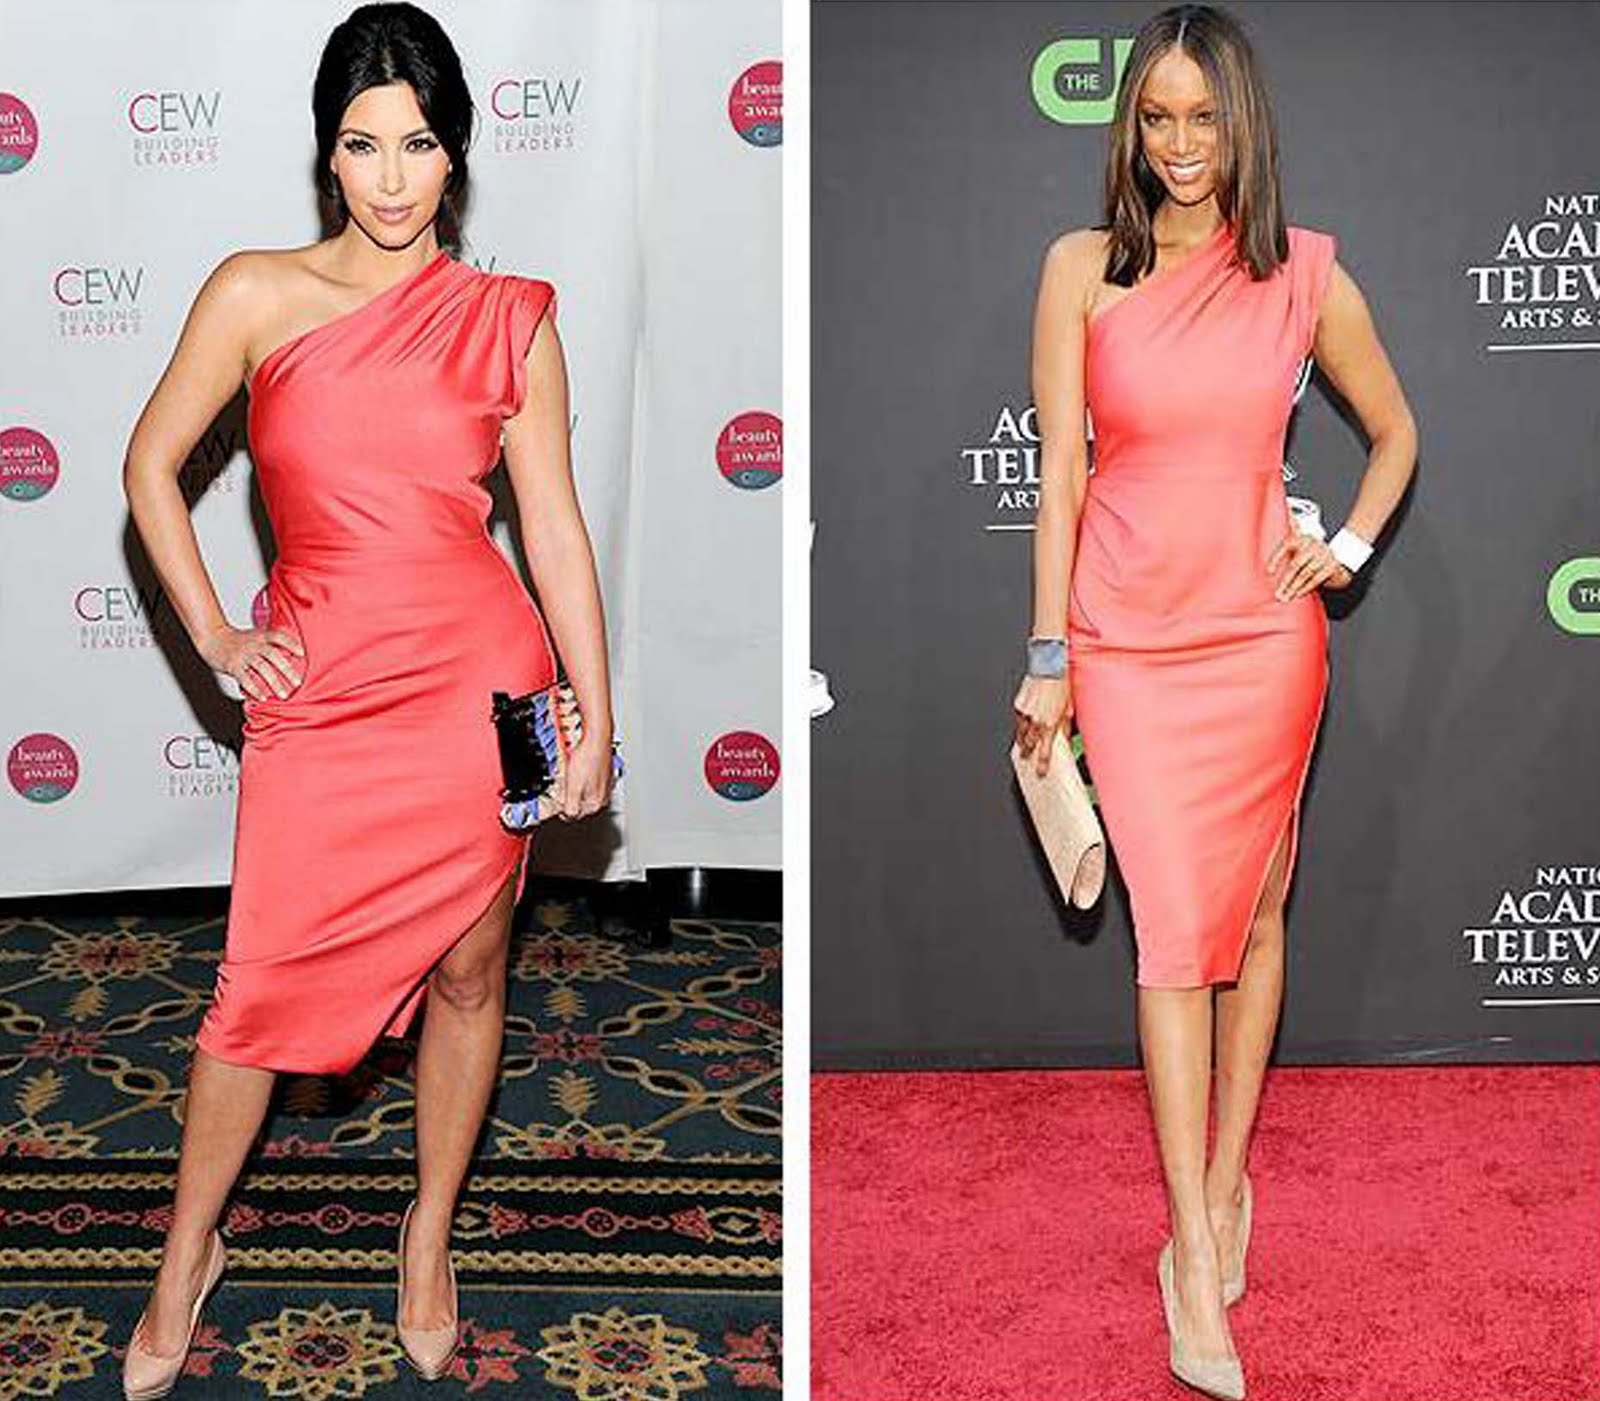 http://2.bp.blogspot.com/-Z0DmZqBcuf4/TkqQgDRWMDI/AAAAAAAAAoA/dauMVR9O3Wk/s1600/kim-kardashian-and-tyra-banks.jpg